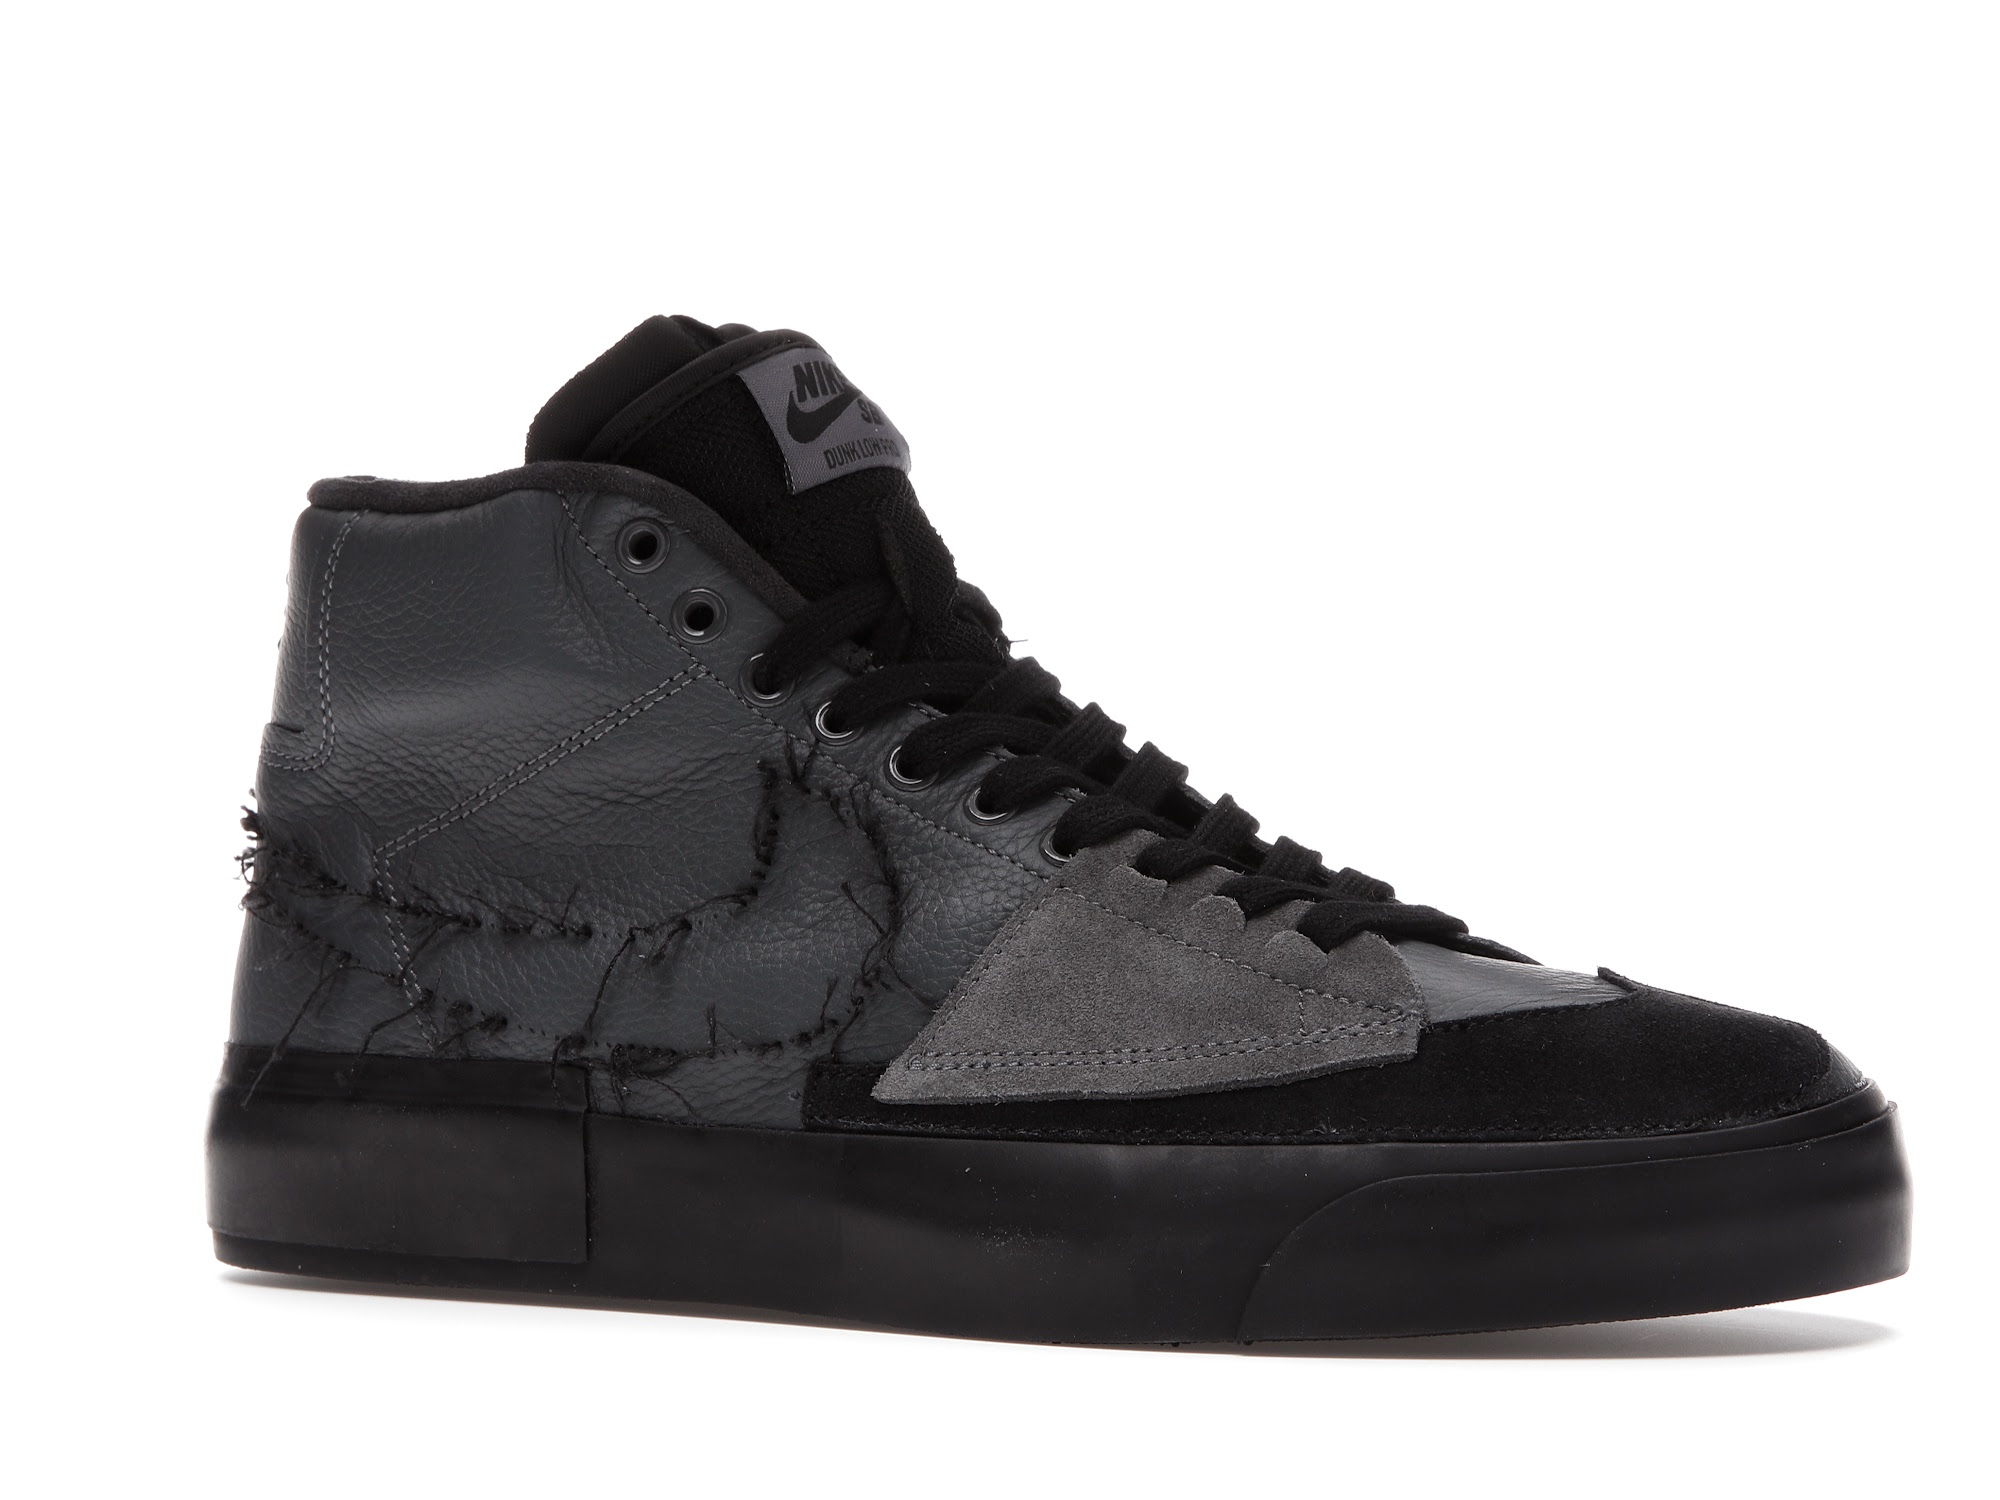 Nike SB Zoom Blazer Mid Edge Iron Grey - DA2189-001